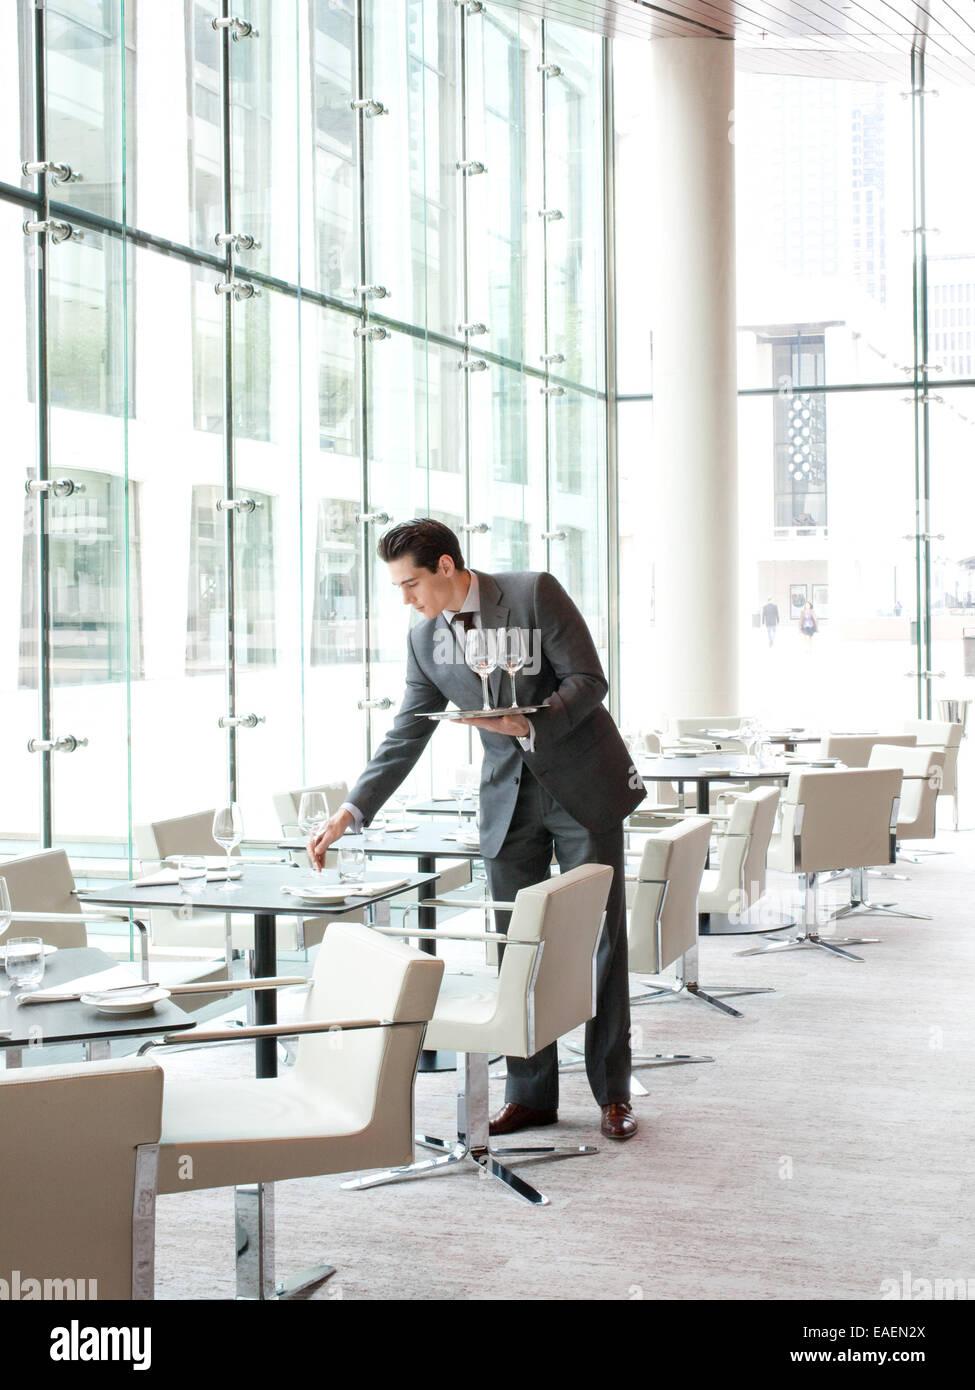 waiter setting table in upscale restaurant - Stock Image